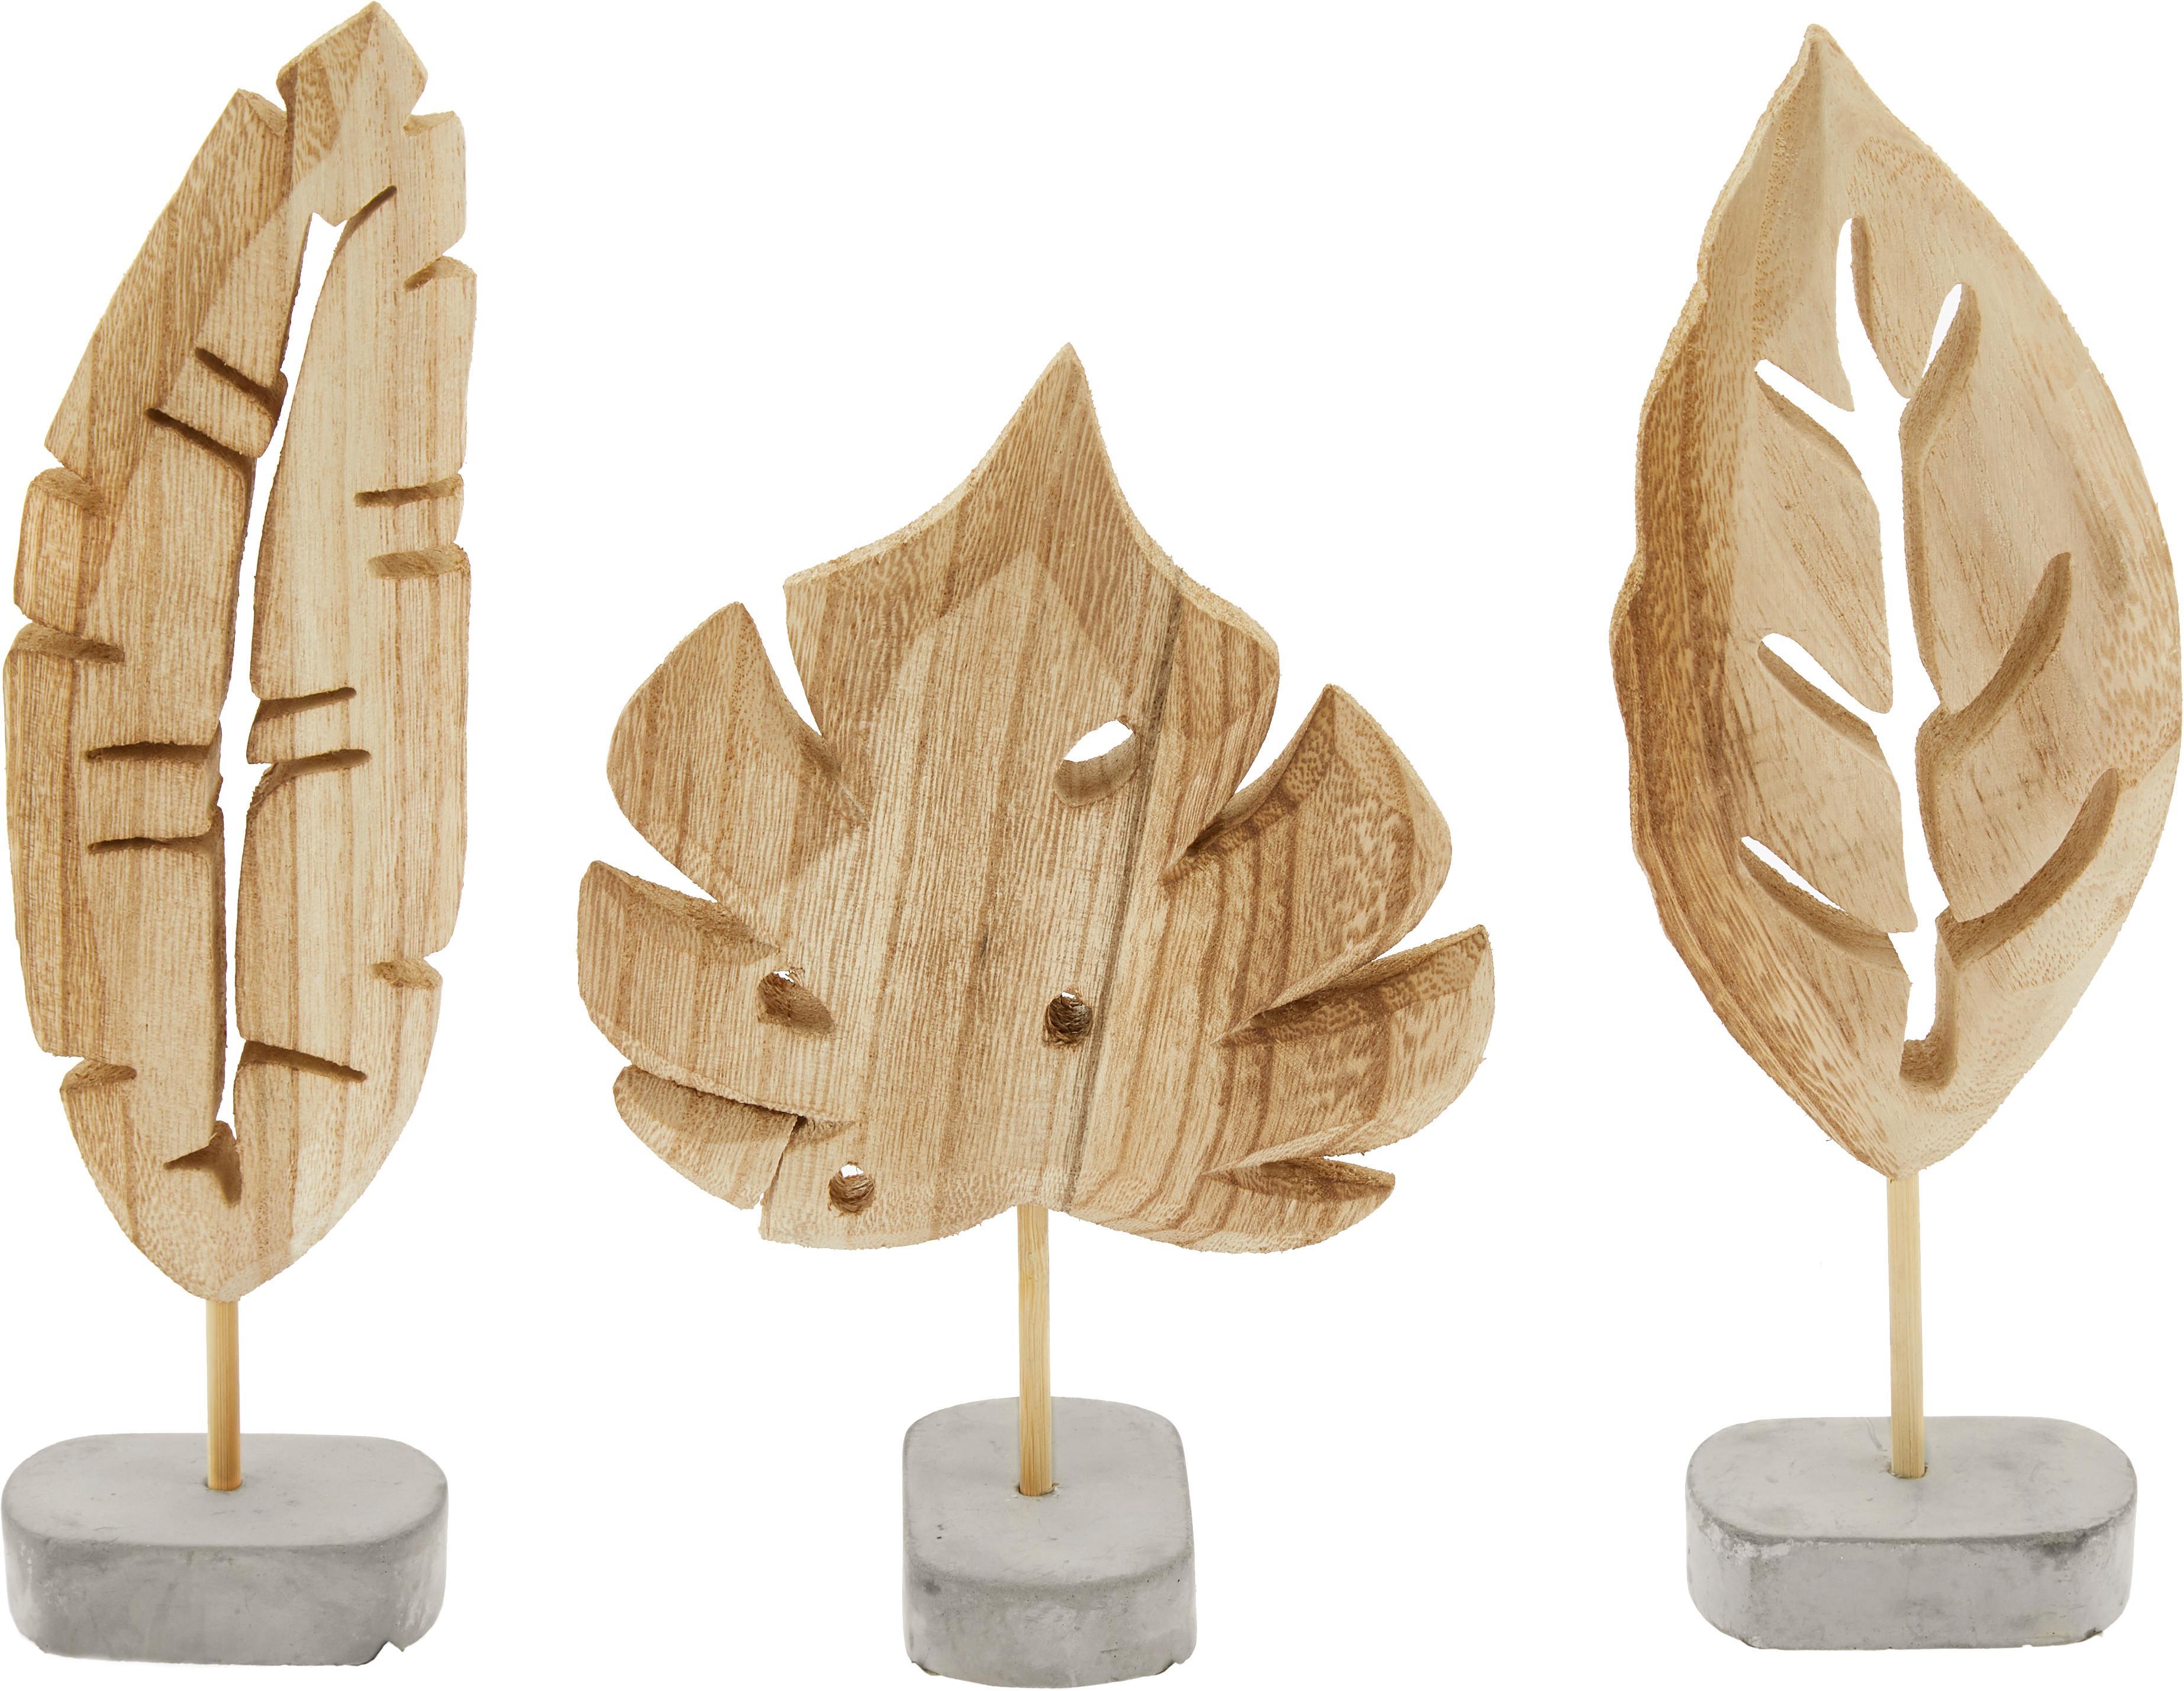 Set de figuras decorativas Blatt, 3pzas., Figura: madera de Paulownia, Base: gris Figura: madera de Paulownia, Tamaños diferentes